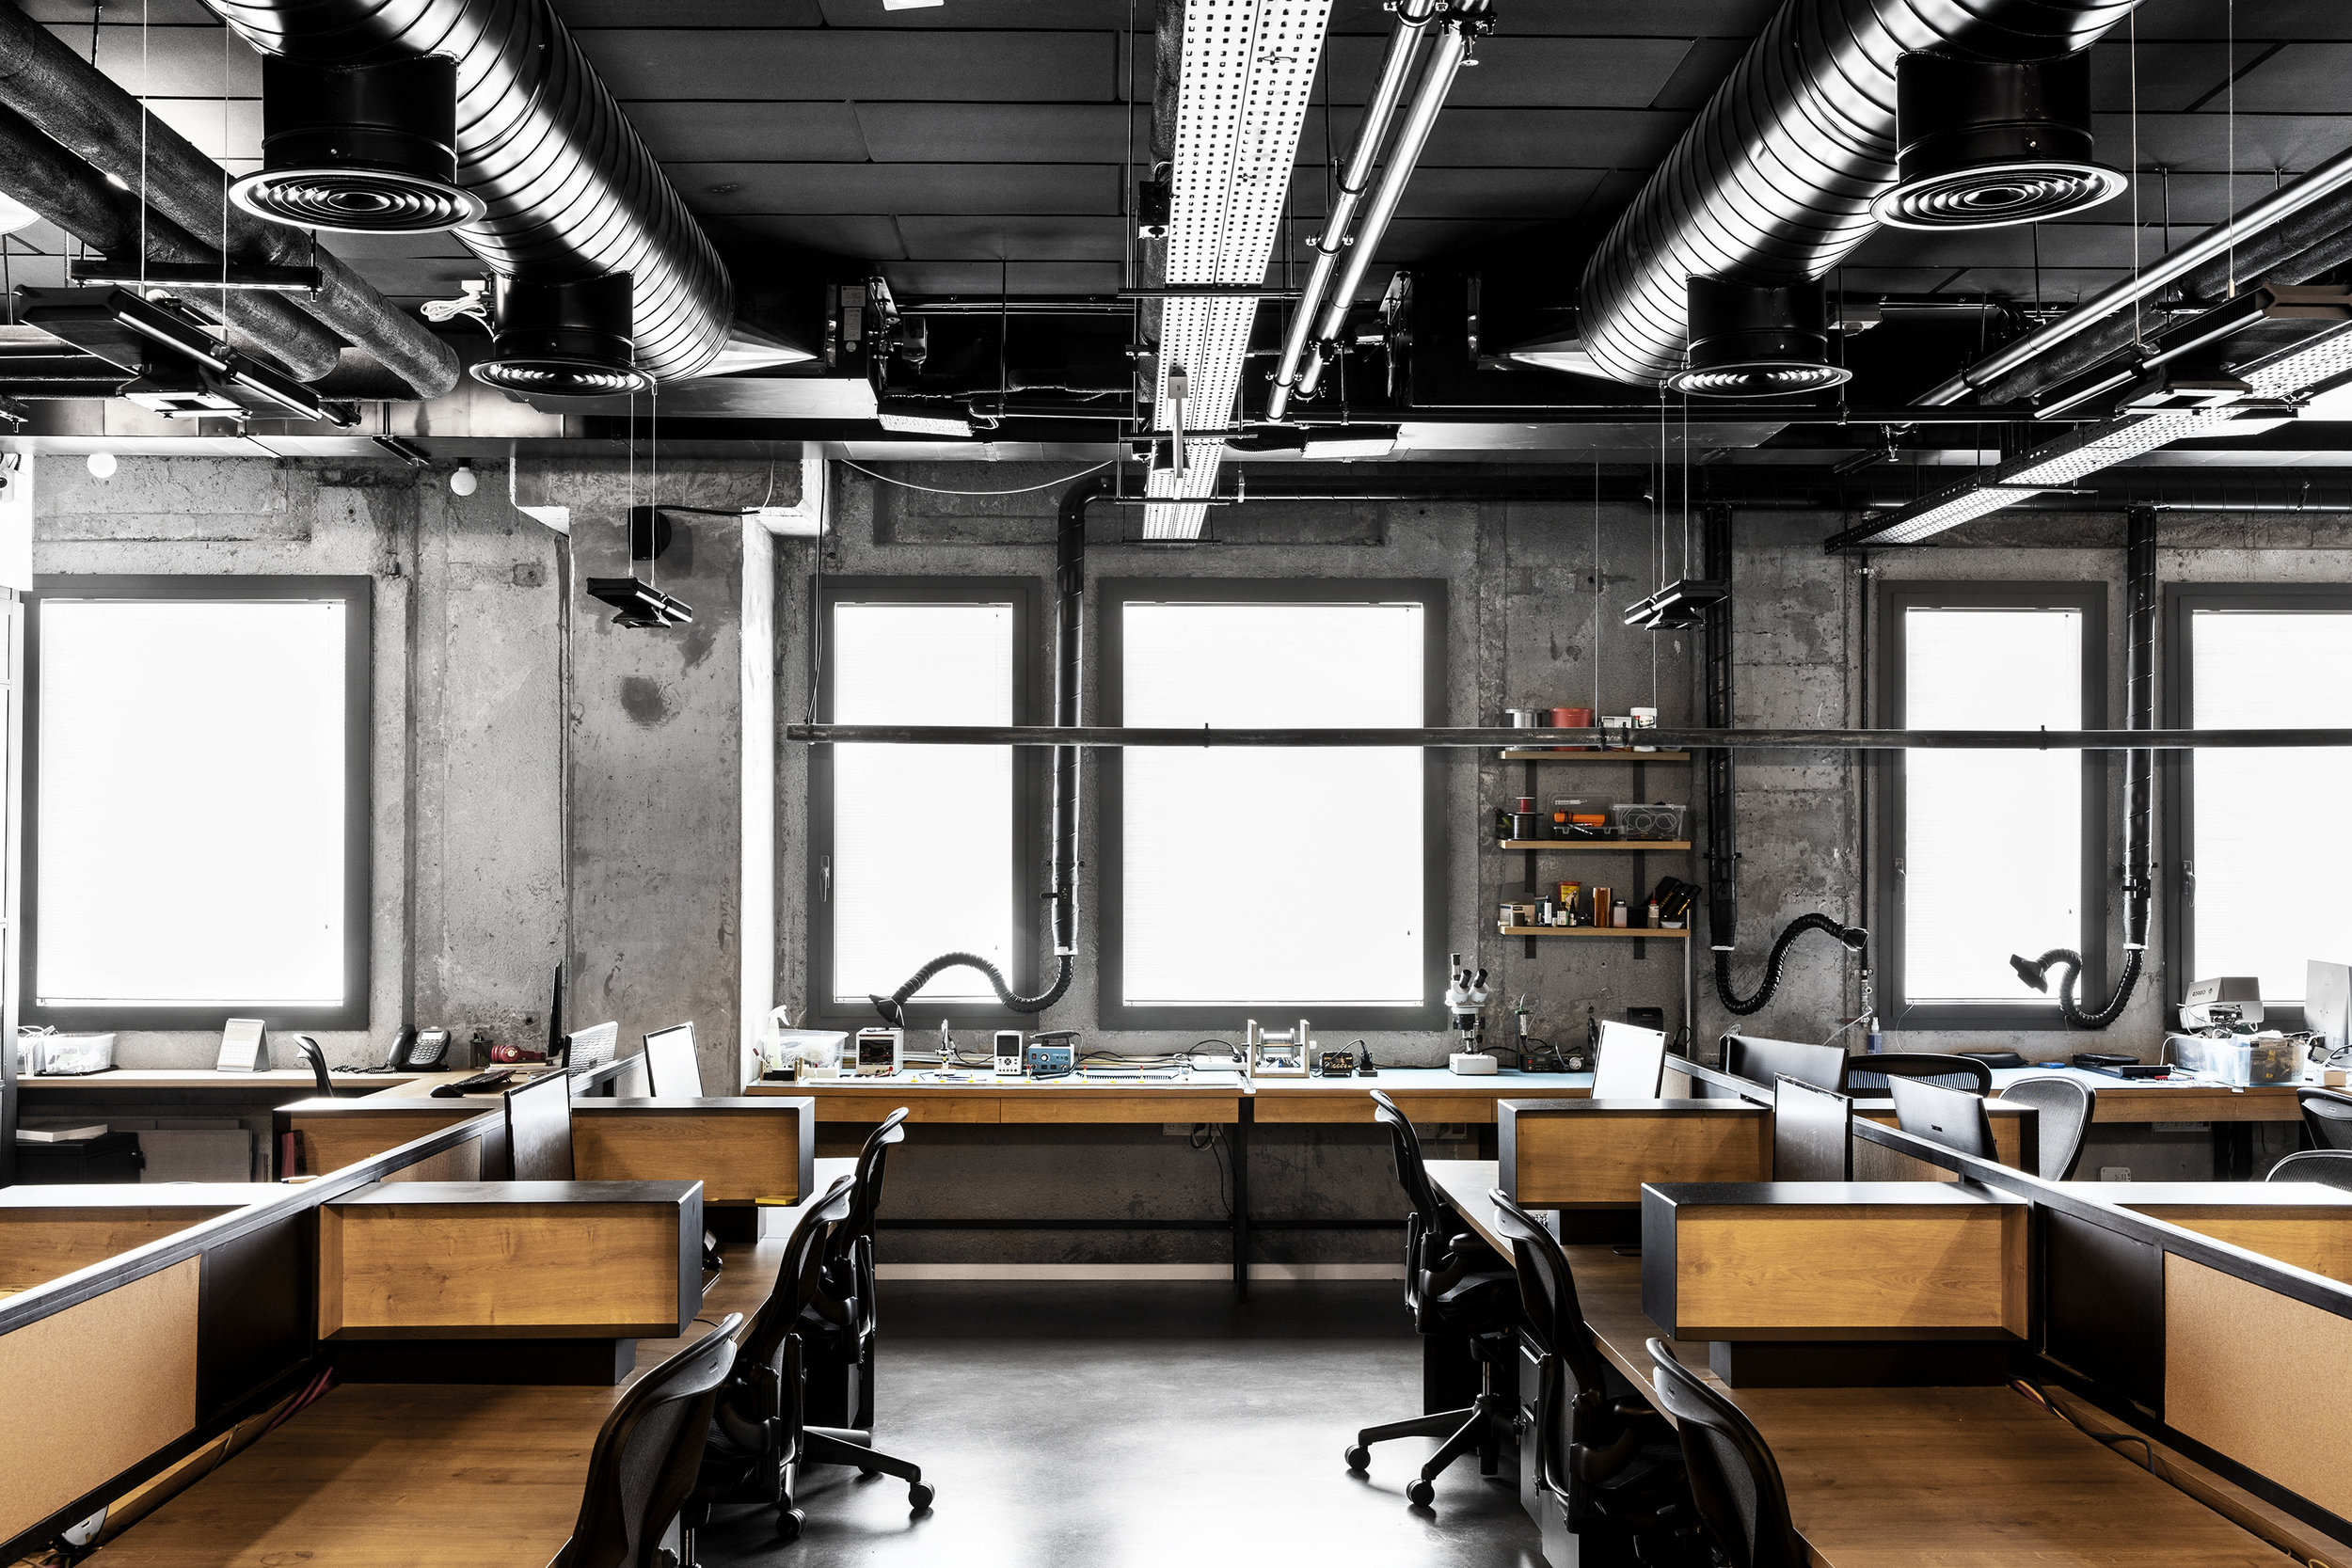 ROY DAVID ARCHITECTURE - STUDIO - ART MEDICAL OFFICES - רואי דוד אדריכלים - סטודיו רואי דוד - אדריכלות - ארט מדיקל (13).jpg